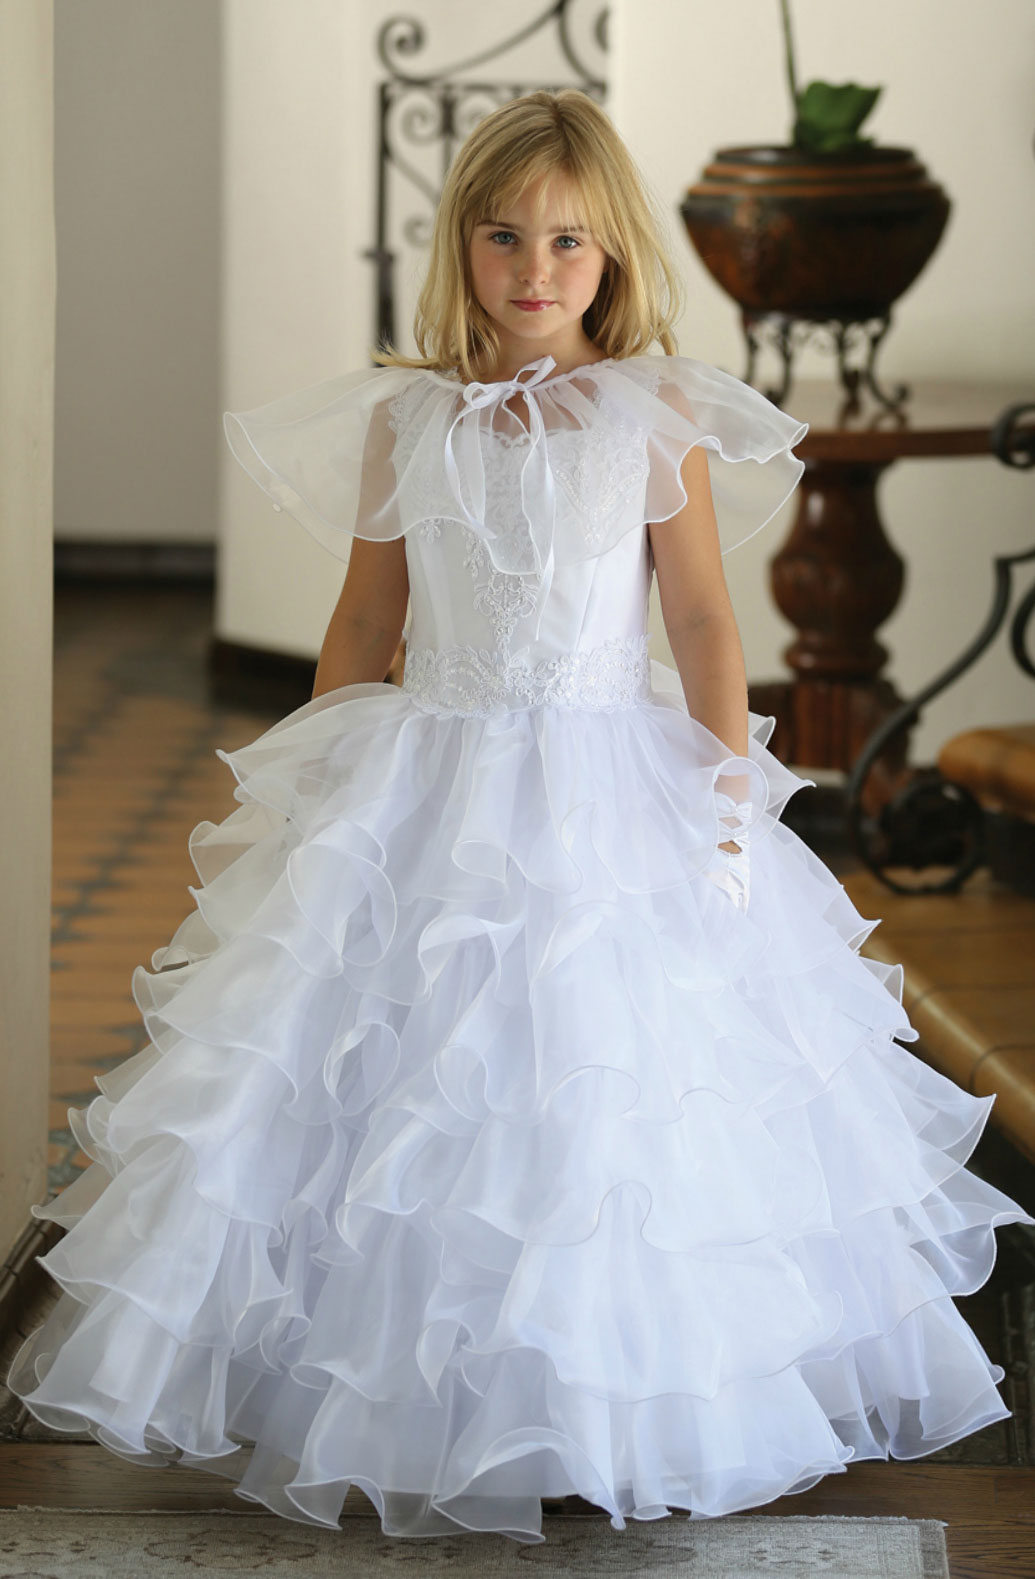 Black Dresses Flower And Girl Silver